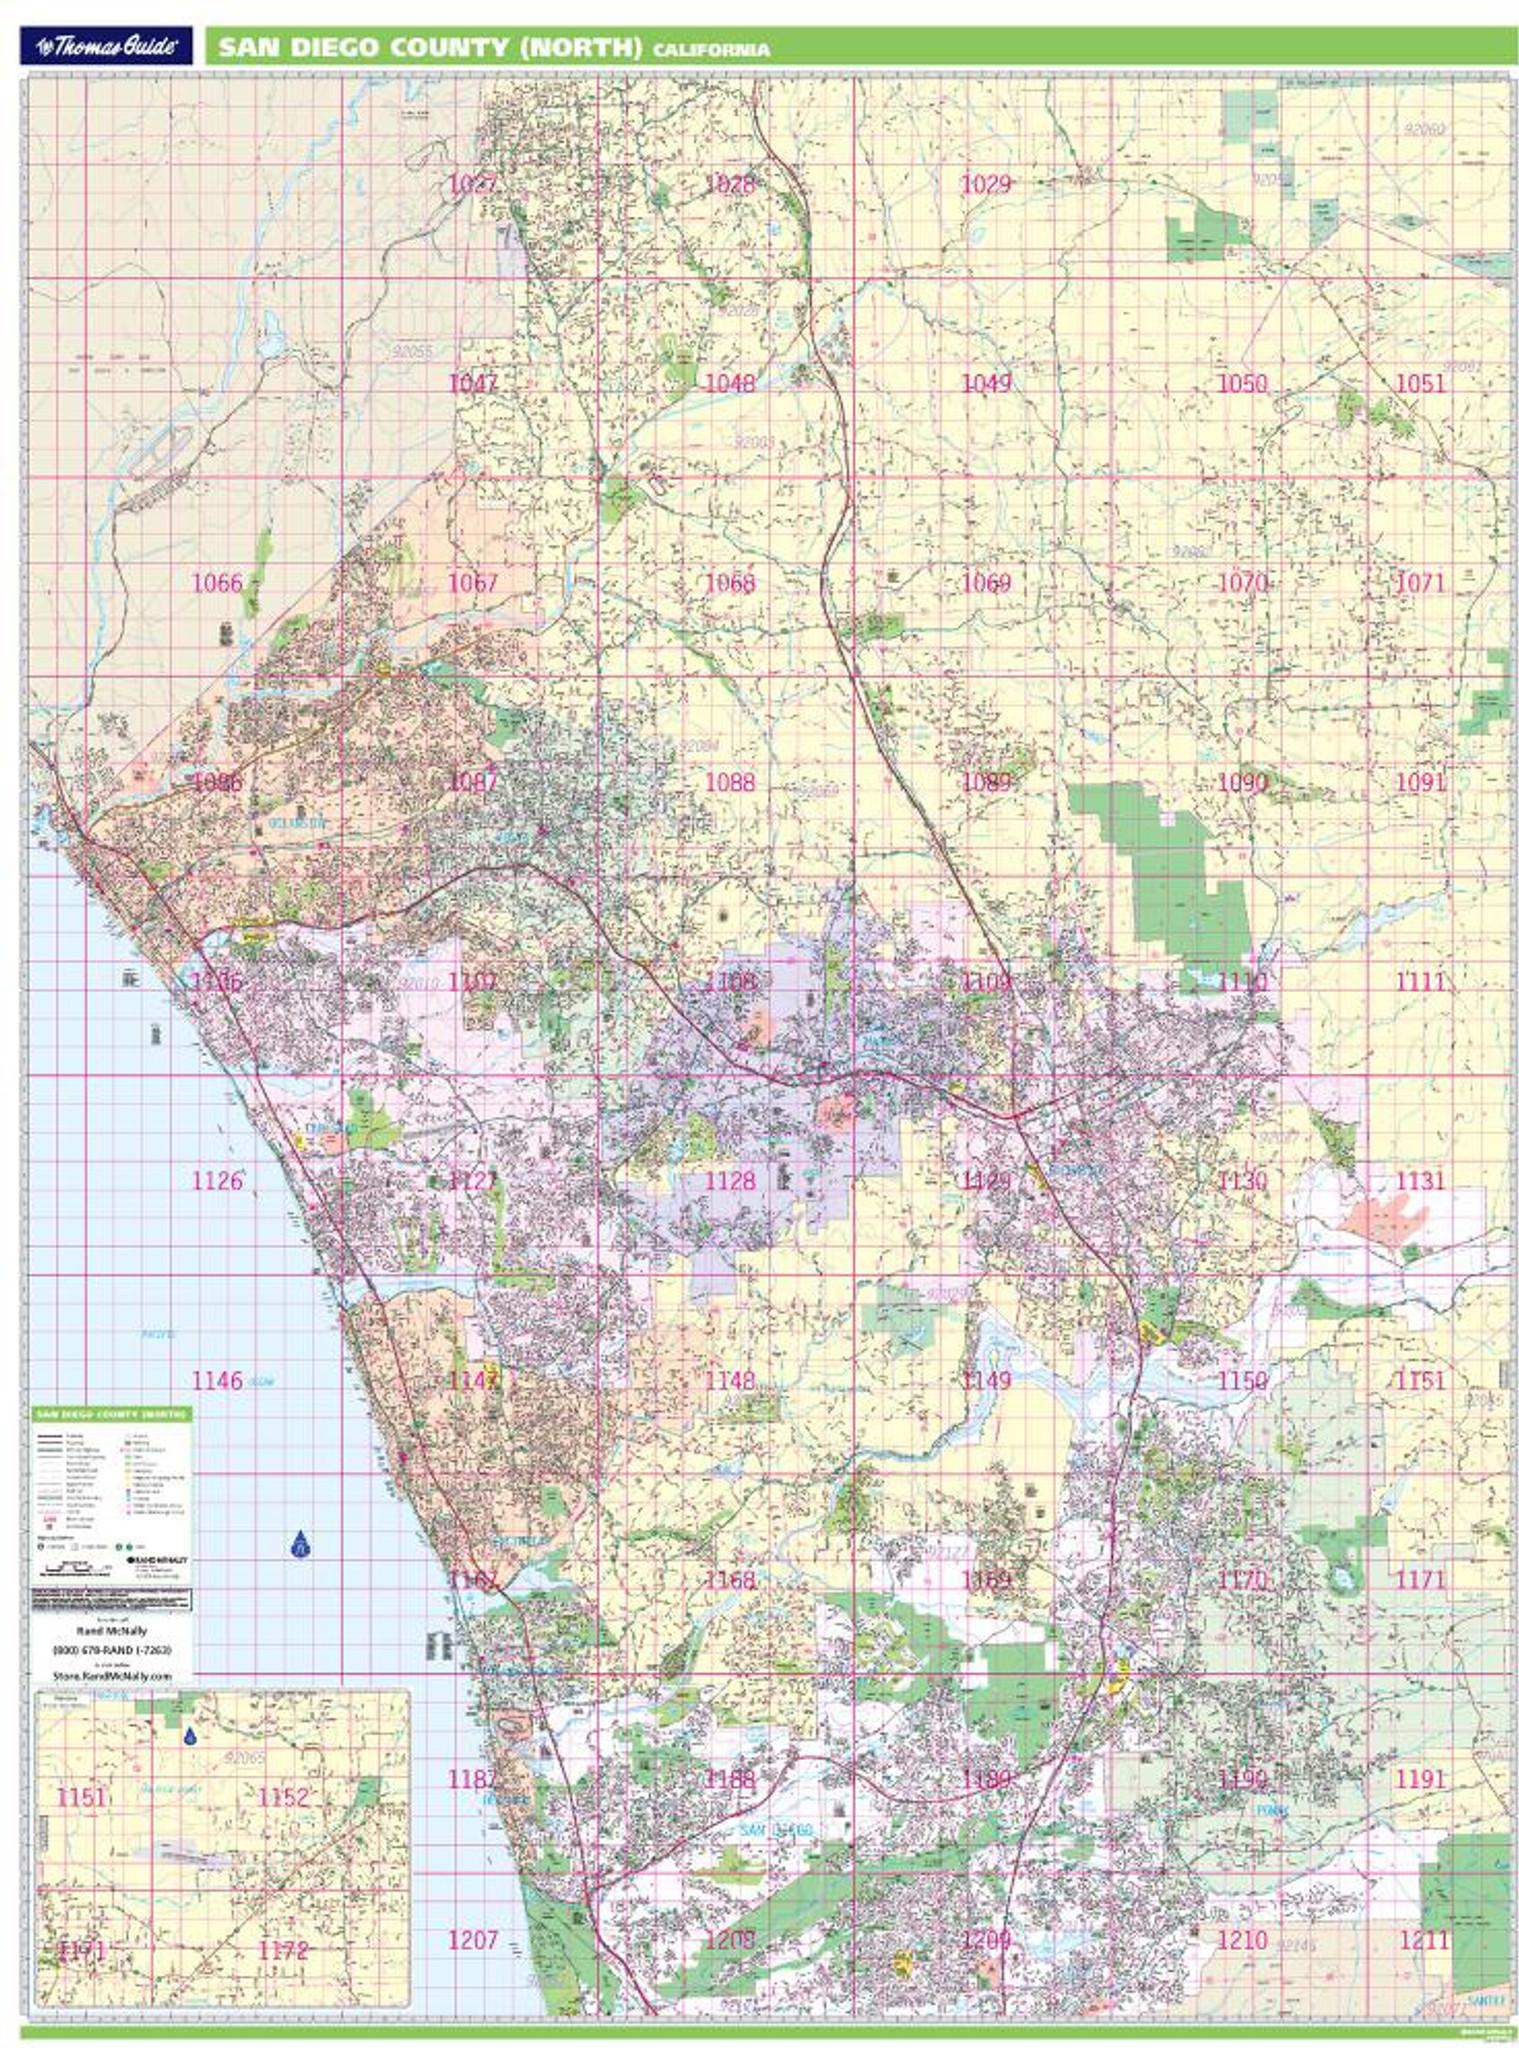 North County San Diego Map Thomas Bros. North San Diego County Wall Map